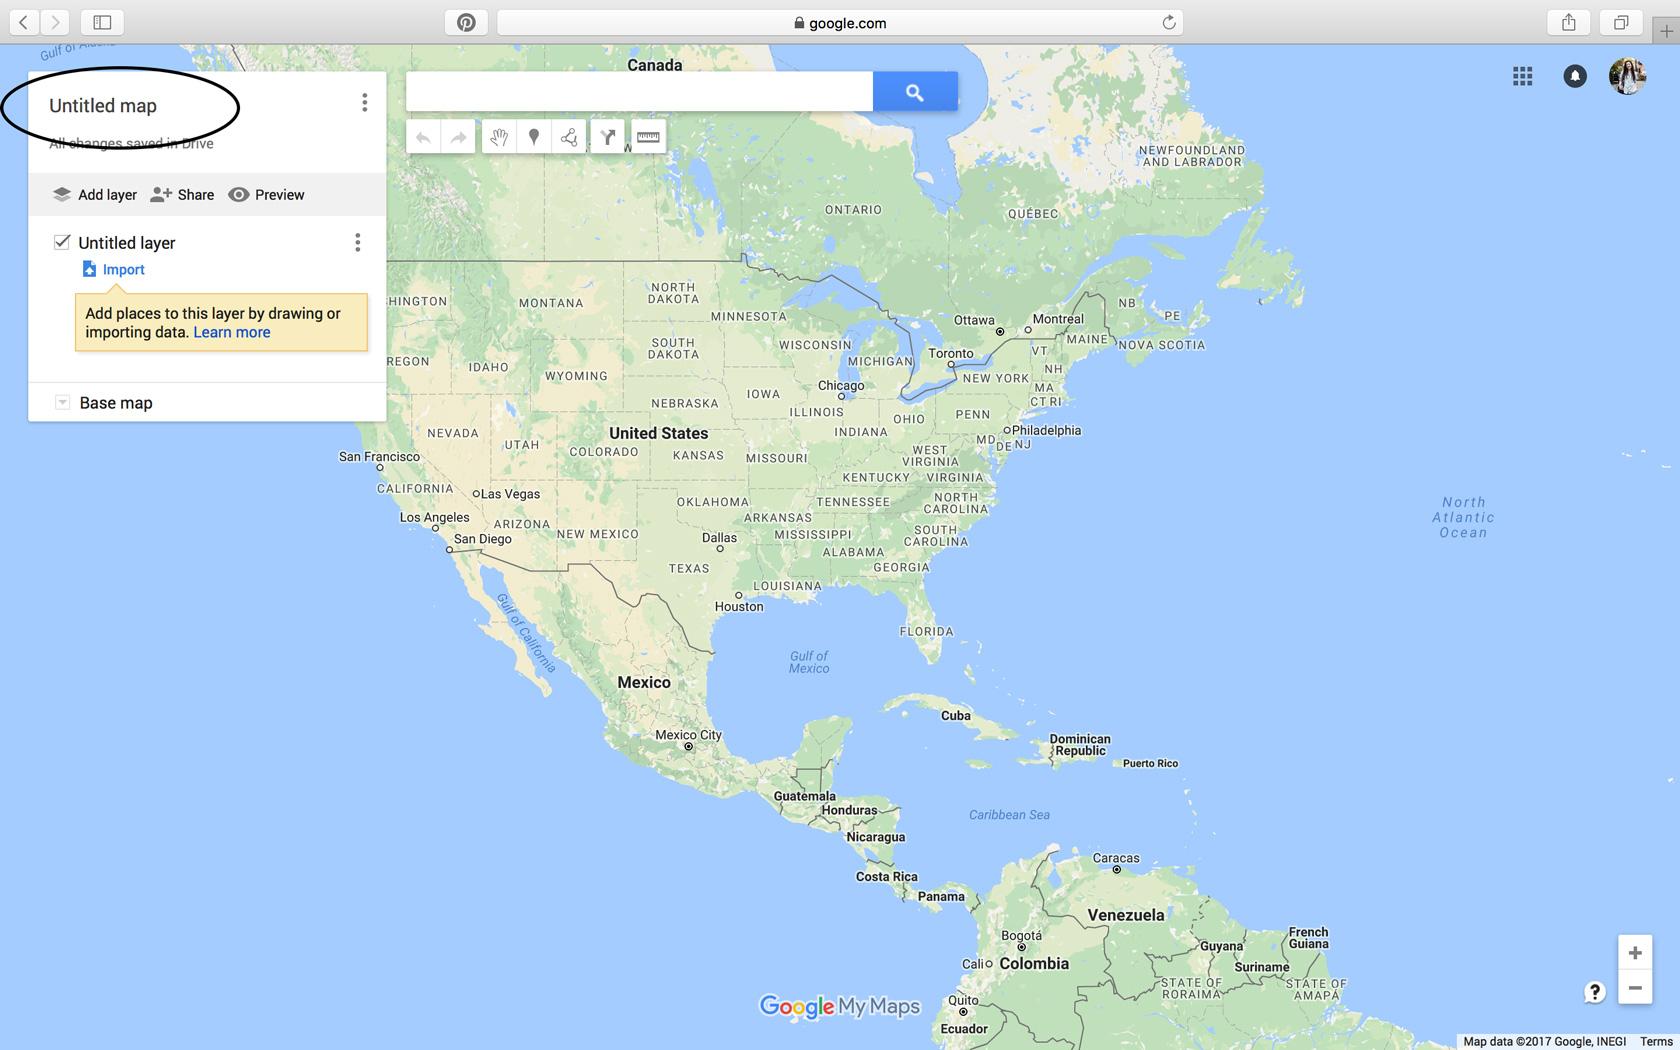 UFO Ufology UFO Orb Fleet On Google Earth Google Map Foreclosure - America google maps